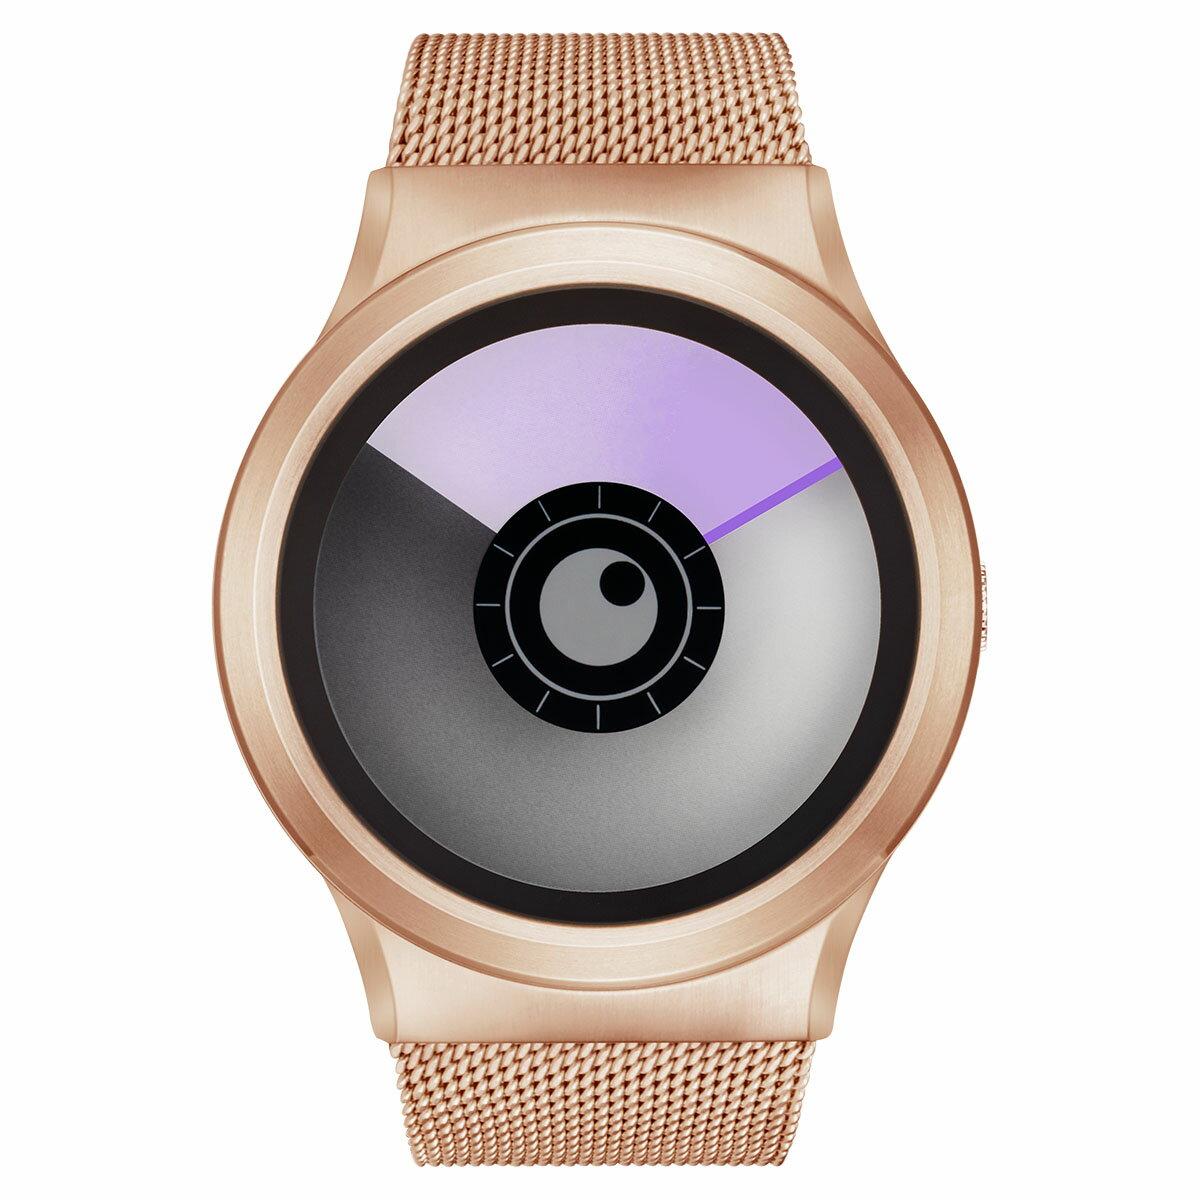 ZEROO AURORA BOREALIS ゼロ 電池式クォーツ 腕時計 [W12023B05SM05] パープル デザインウォッチ ペア用 メンズ レディース ユニセックス おしゃれ時計 デザイナーズ